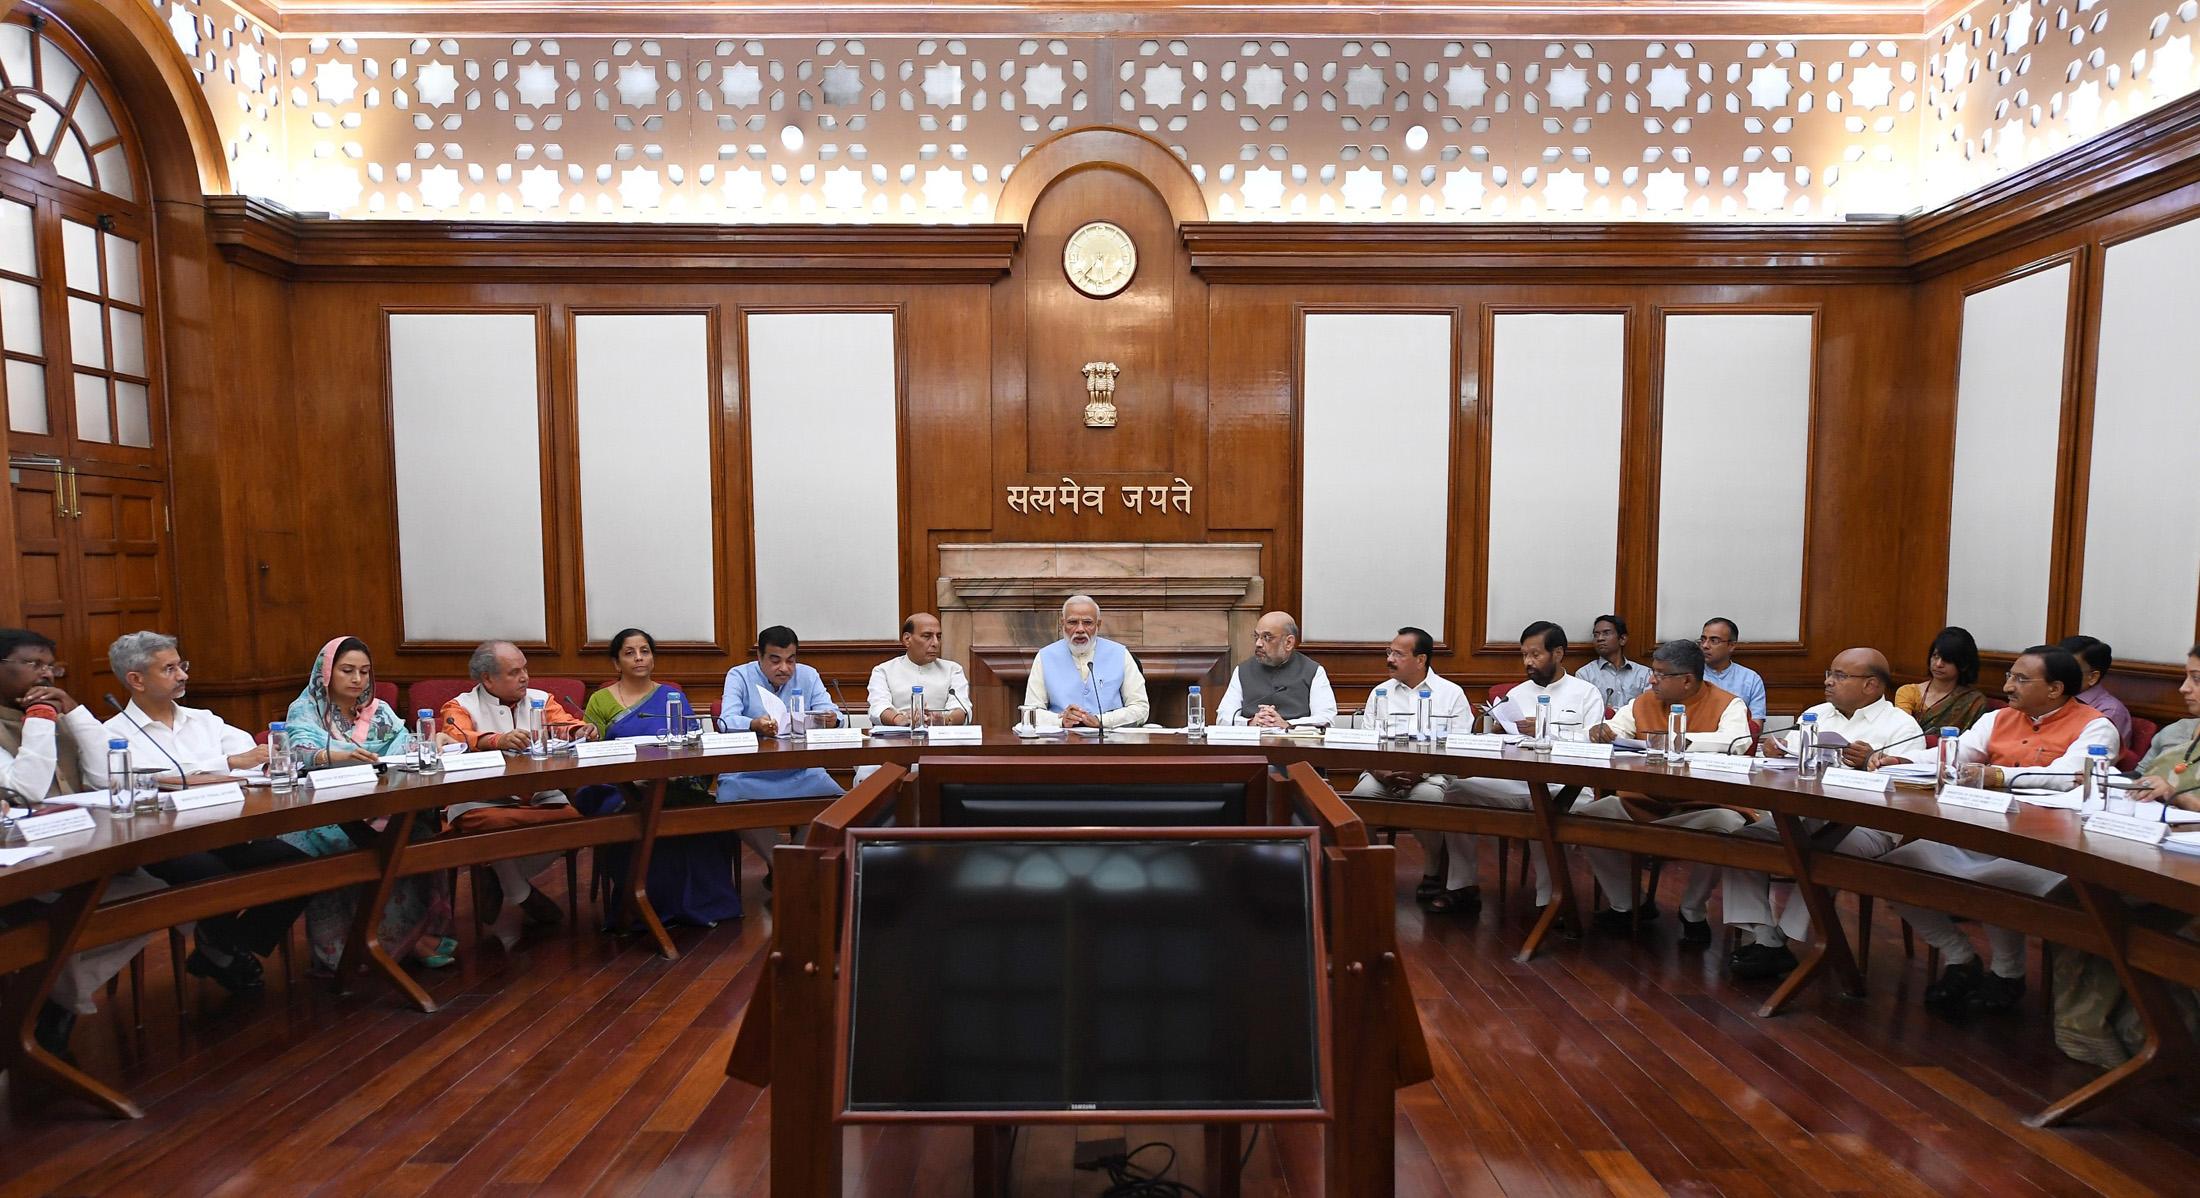 The Prime Minister, Shri Narendra Modi at the first cabinet meeting, at the Prime Minister's Office, in South Block, New Delhi on May 31, 2019.